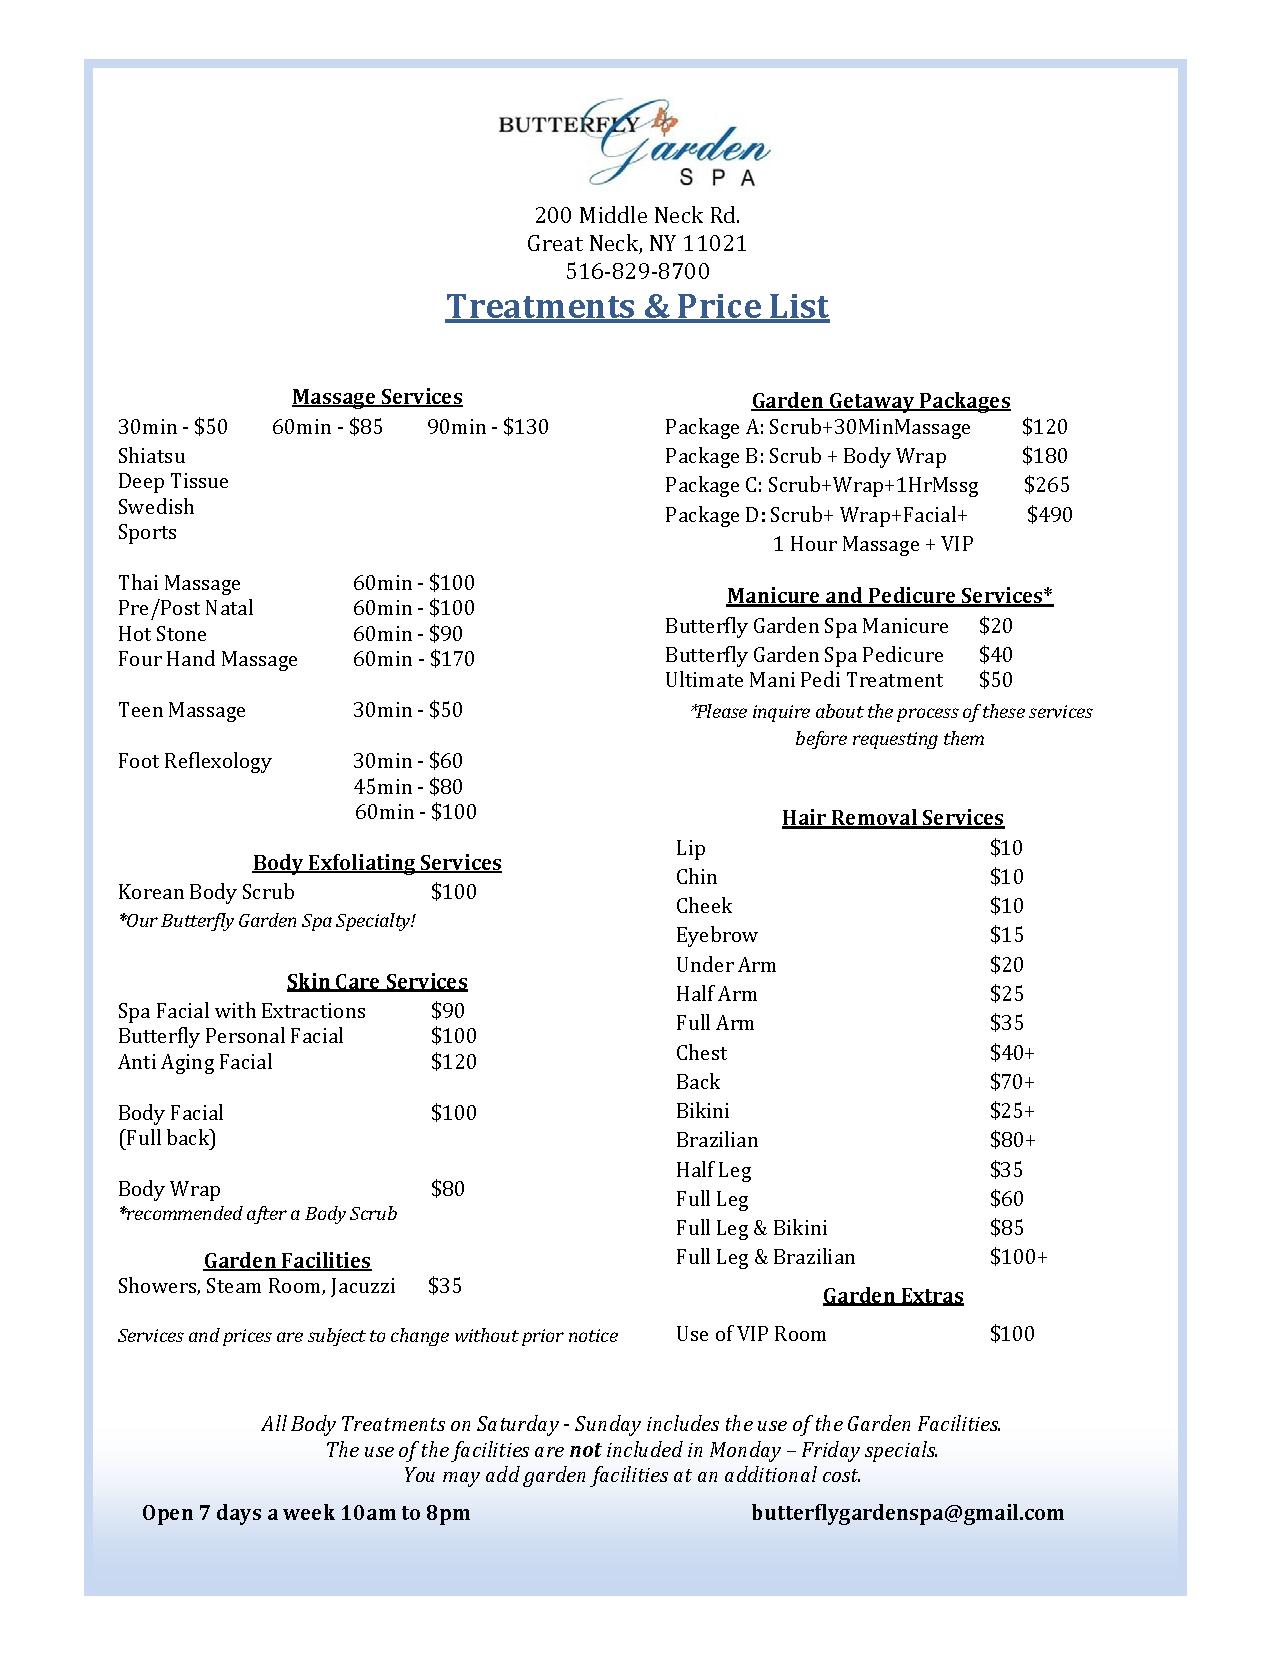 Incroyable 2014 Price List